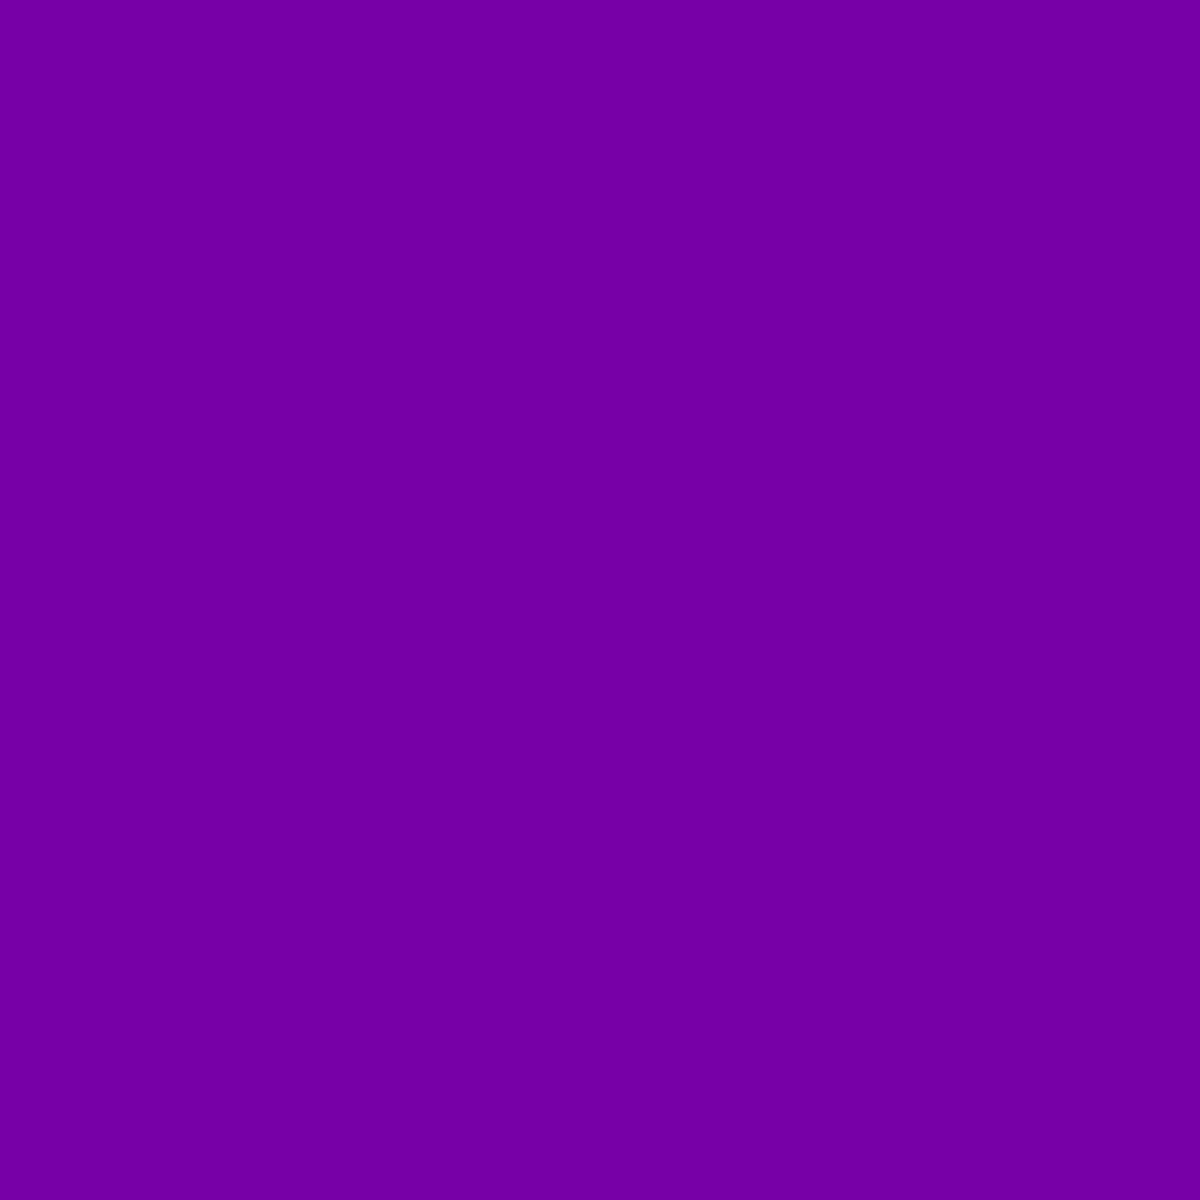 Виниловая самоклеющаяся пленка (глянец) G-3021 (1,06м х45,7м)